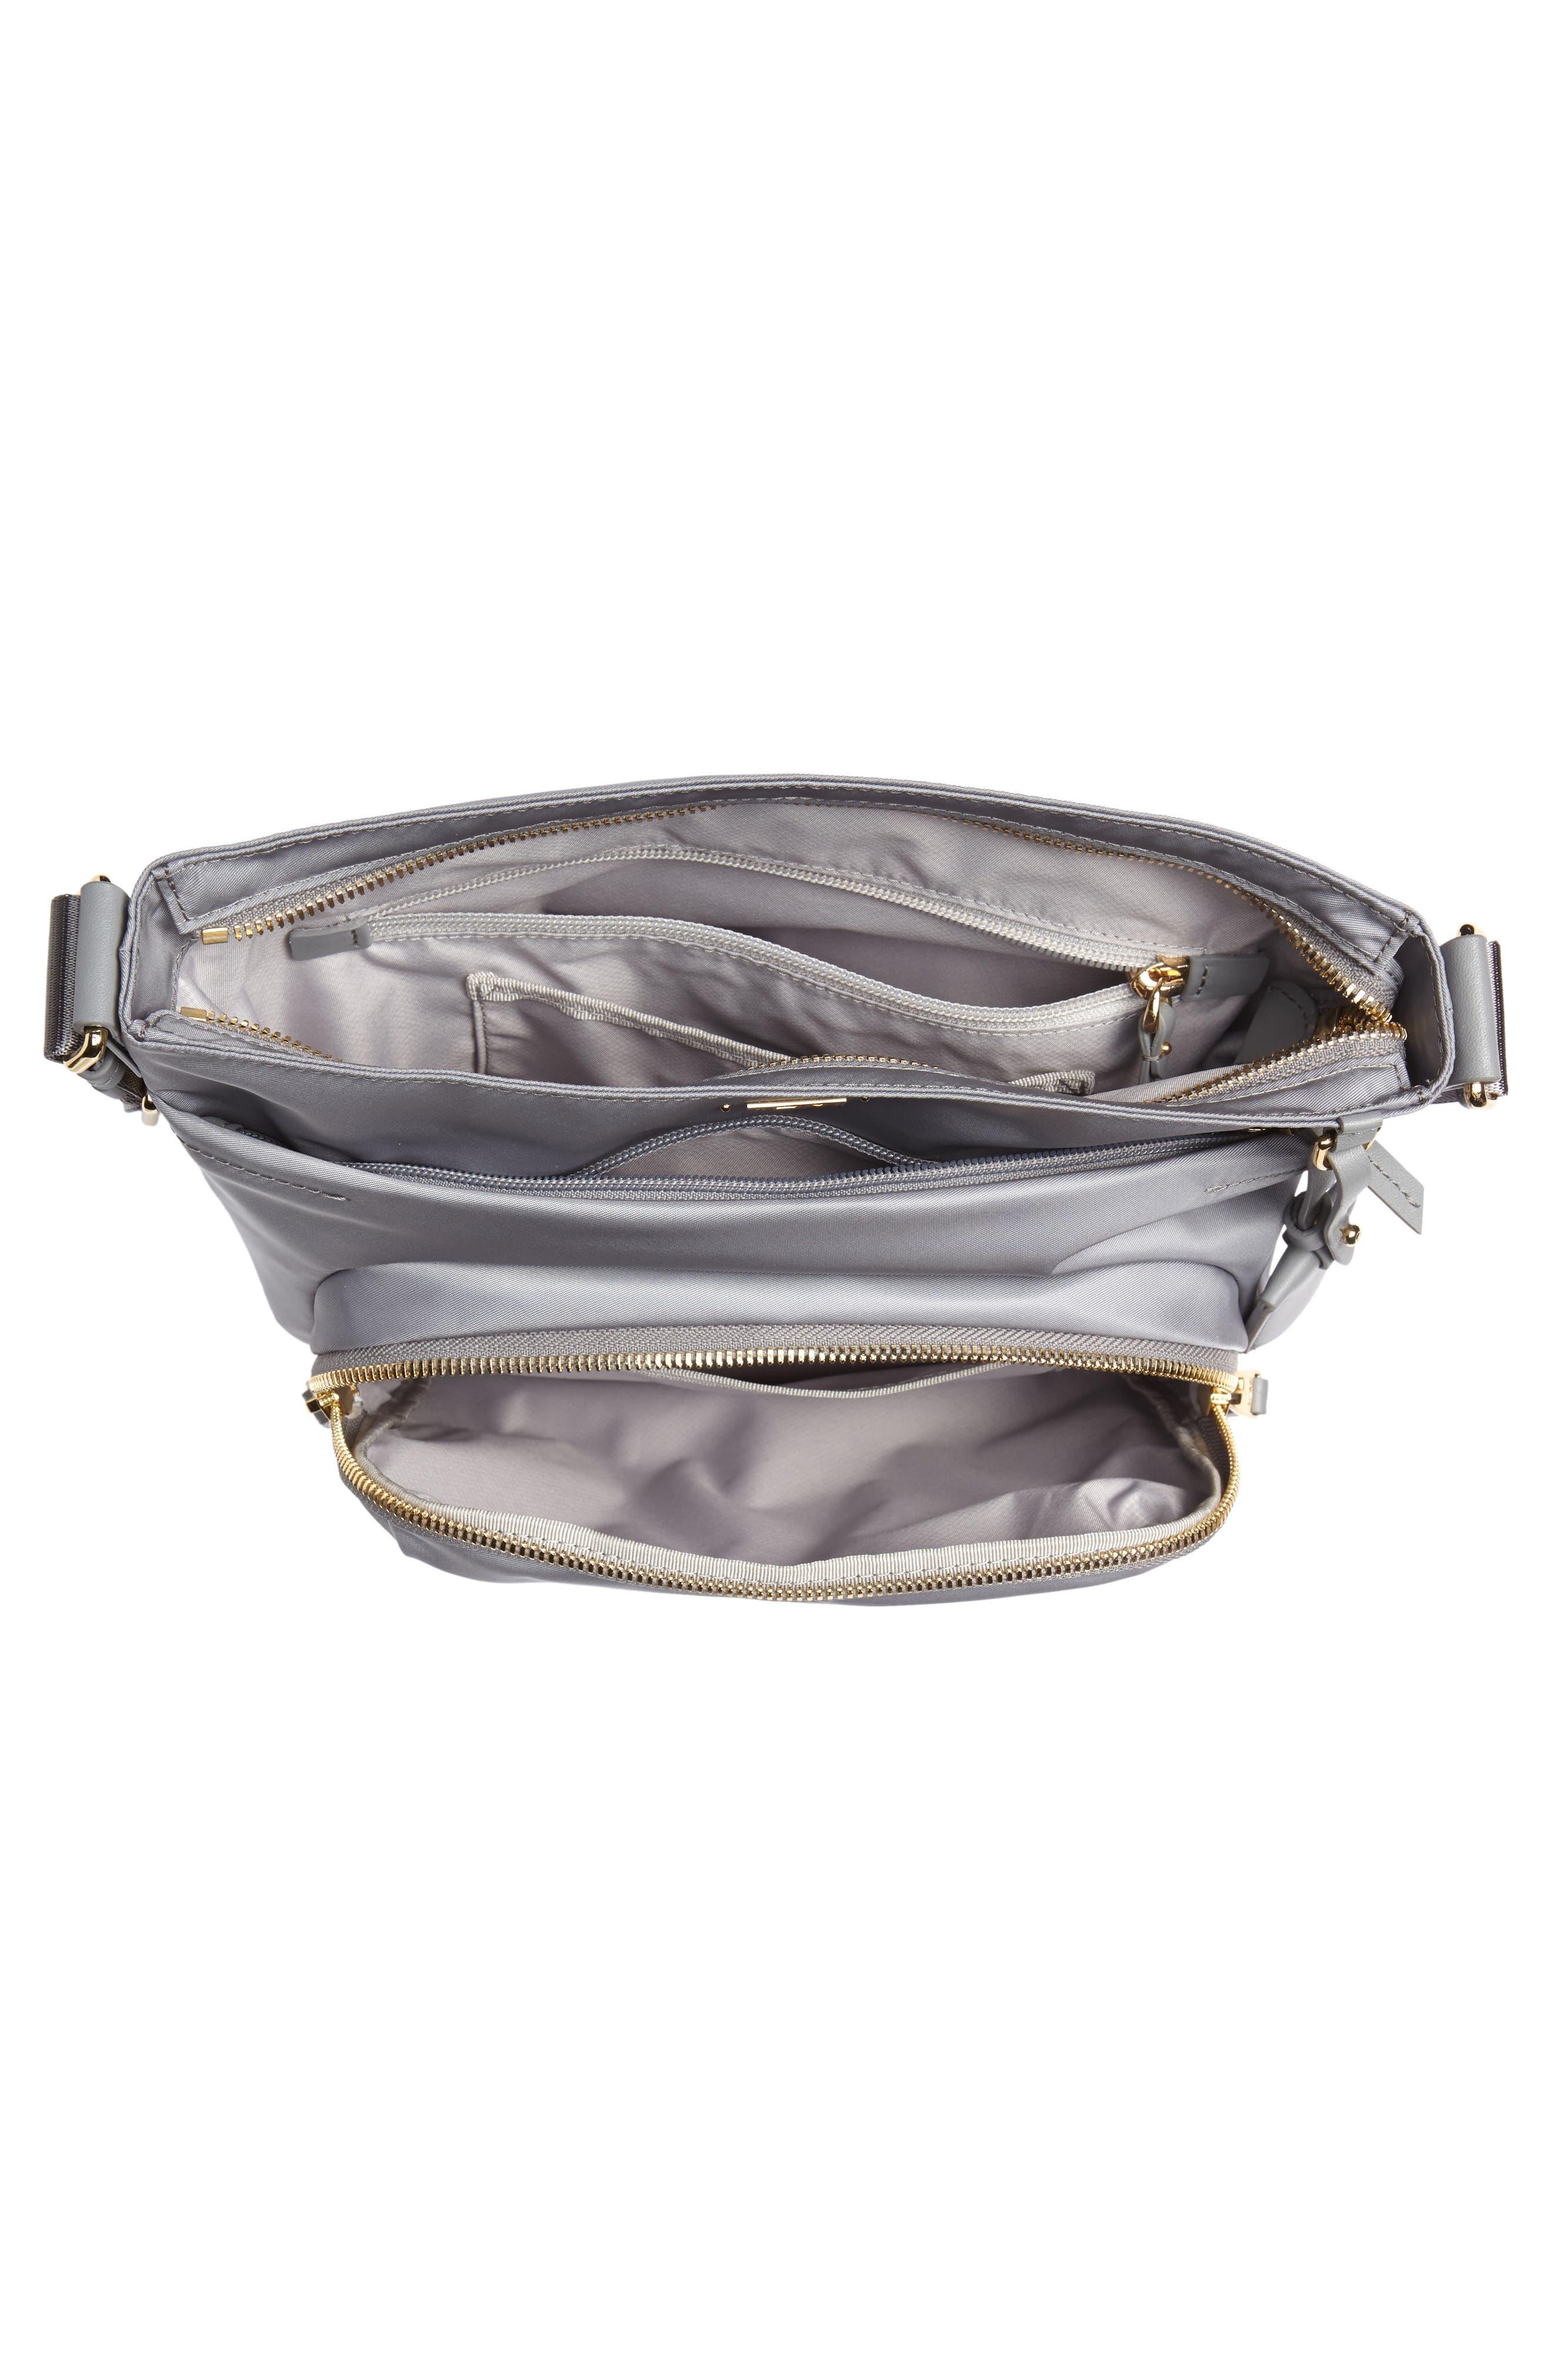 Voyager - Capri Nylon Crossbody Bag,                             Alternate thumbnail 4, color,                             Grey